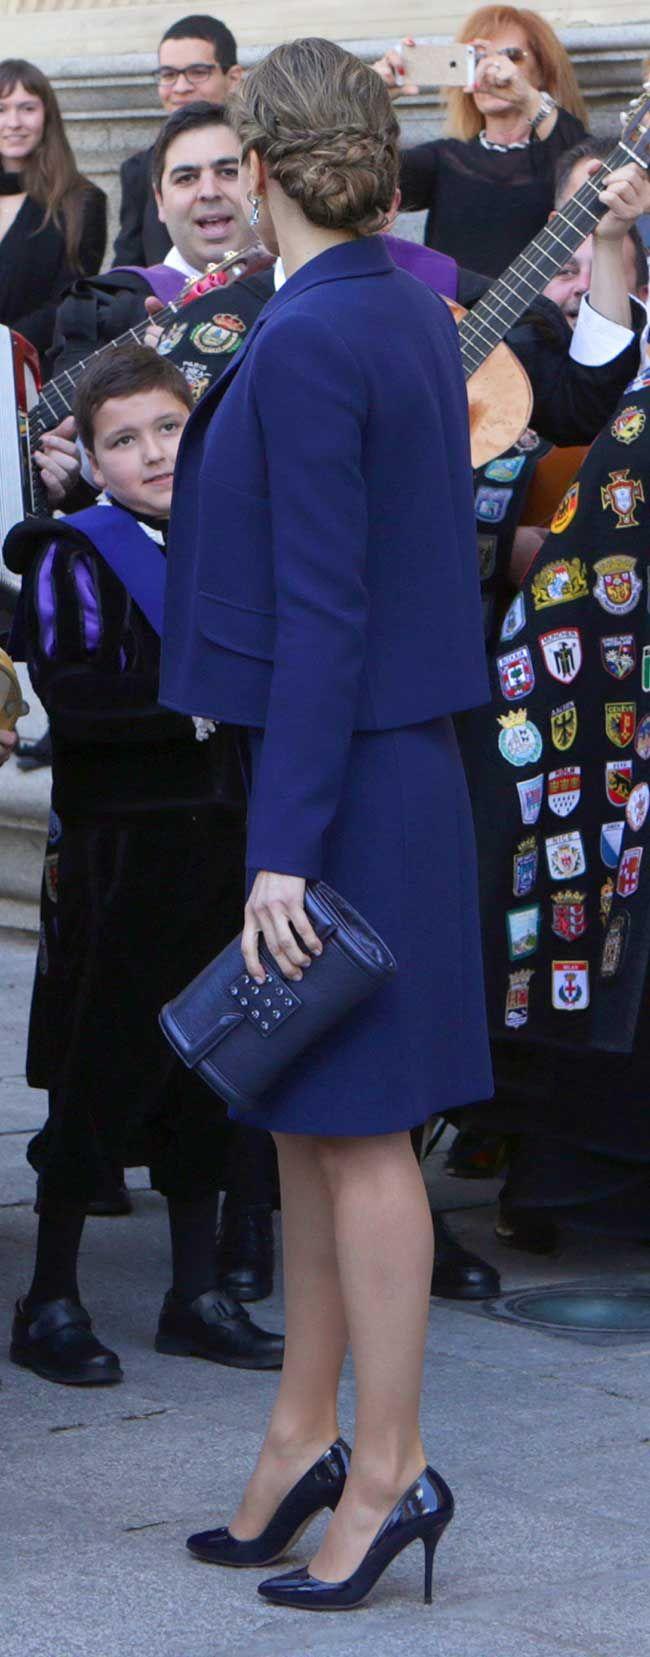 12 October 2015 - Queen Letizia attends the Dia de la Fiesta Nacional - dress by Felipe Varela